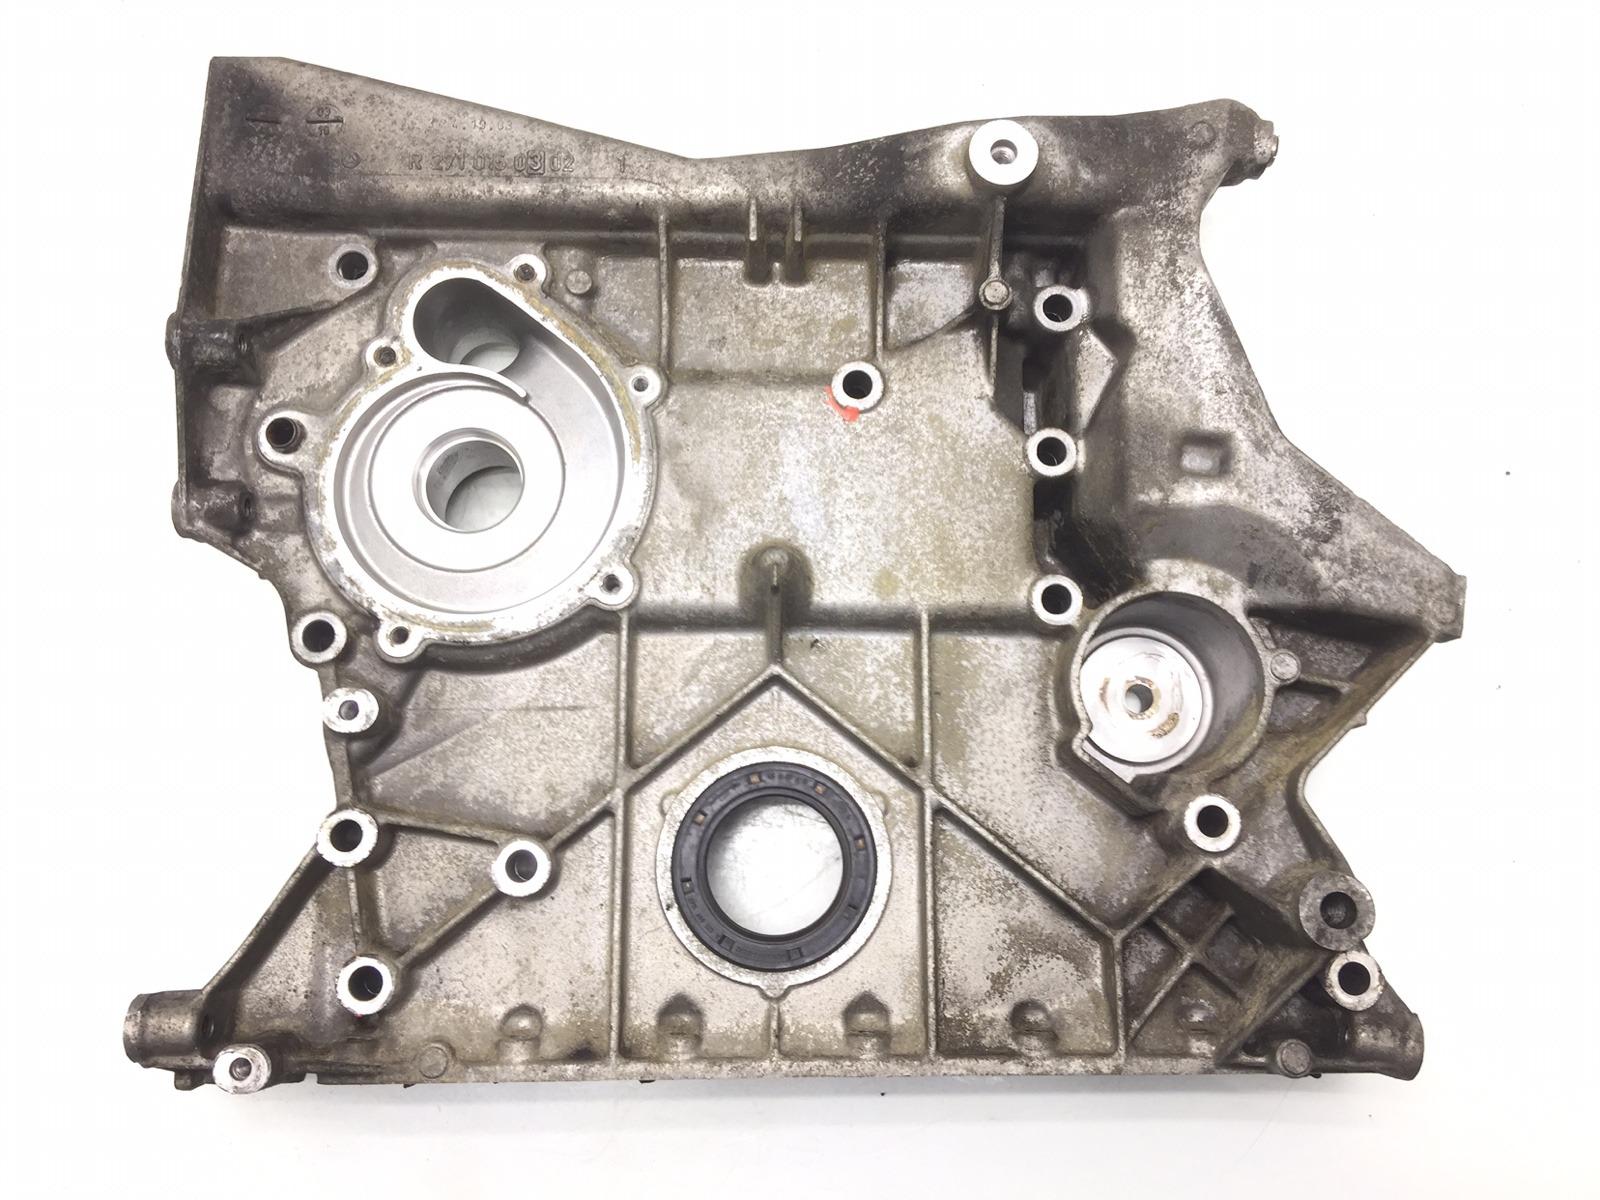 Крышка двигателя передняя Mercedes E W211 1.8 I 2003 (б/у)